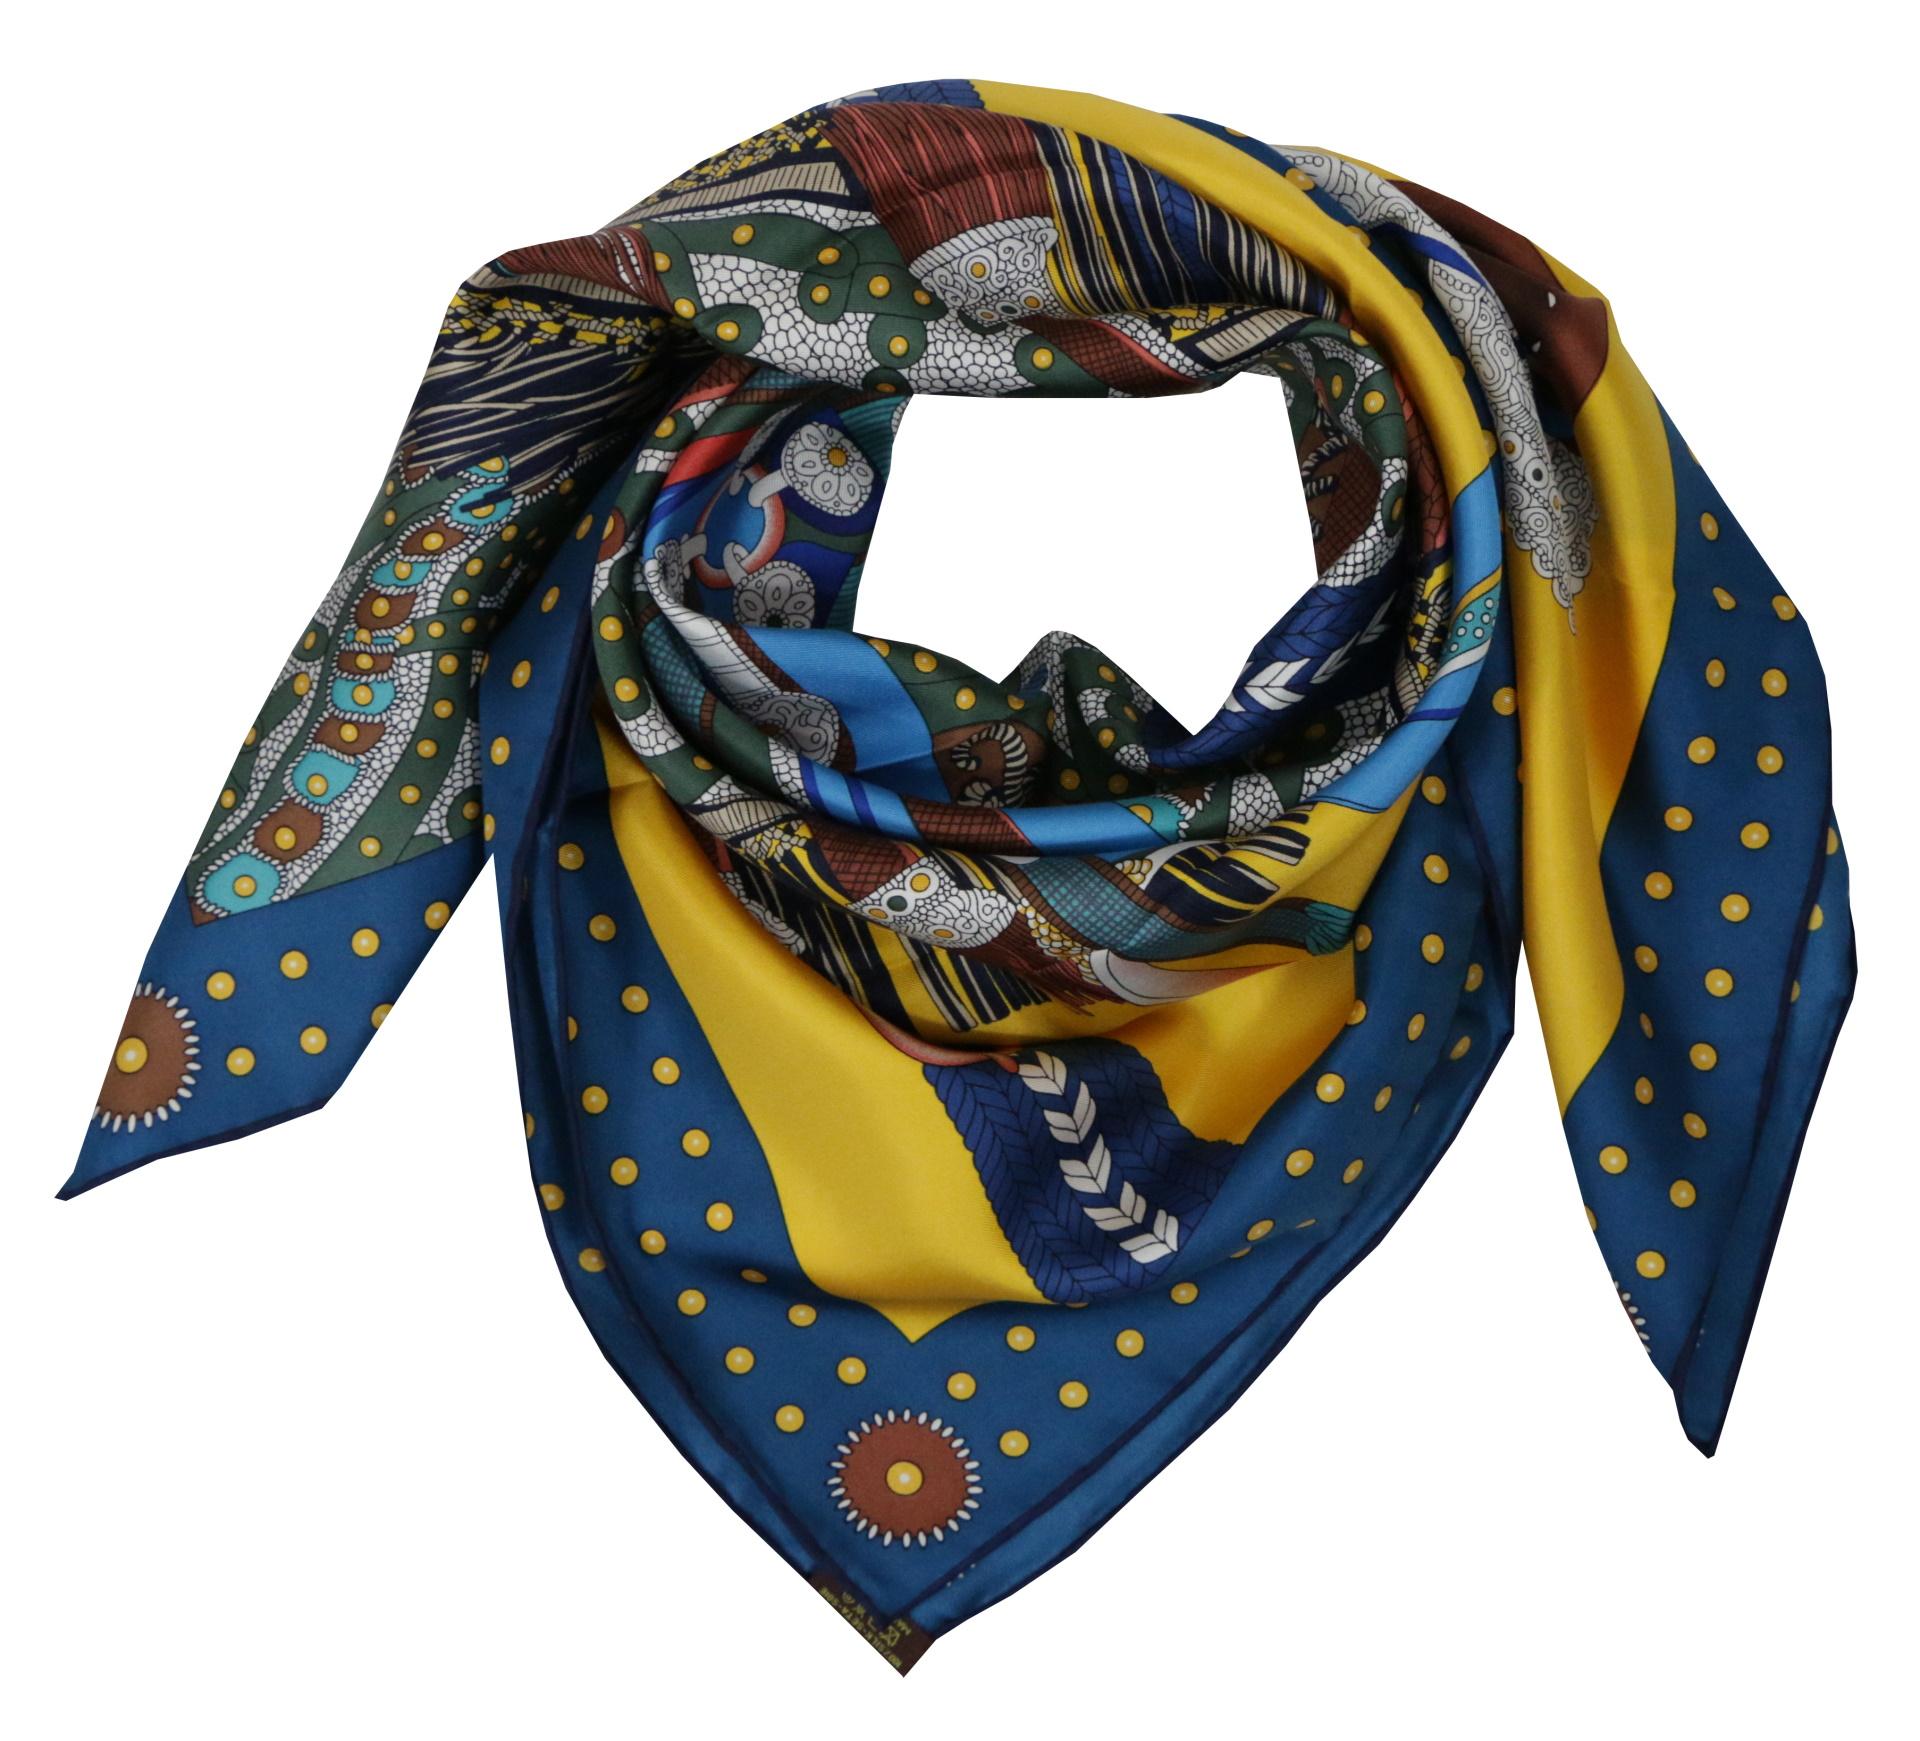 FOULARD L FOULARD SCIARPA DONNA 100 SETA 90CMX90CM 1 1stAmerican foulard/sciarpa 100% seta da donna 90cmx90cm